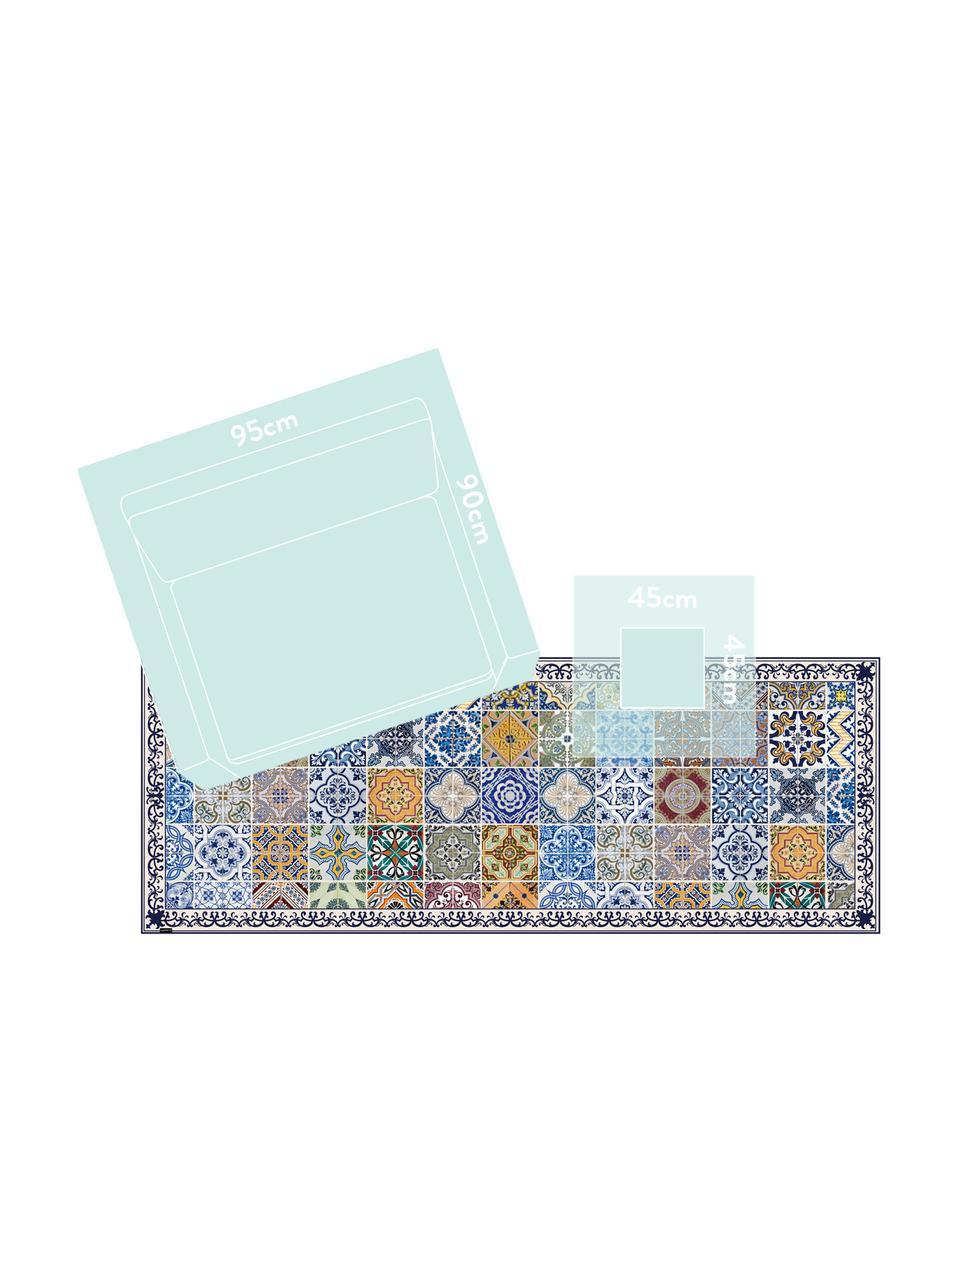 Flache Vinyl-Bodenmatte Pablo mit buntem Print, rutschfest, Vinyl, recycelbar, Mehrfarbig, 65 x 255 cm